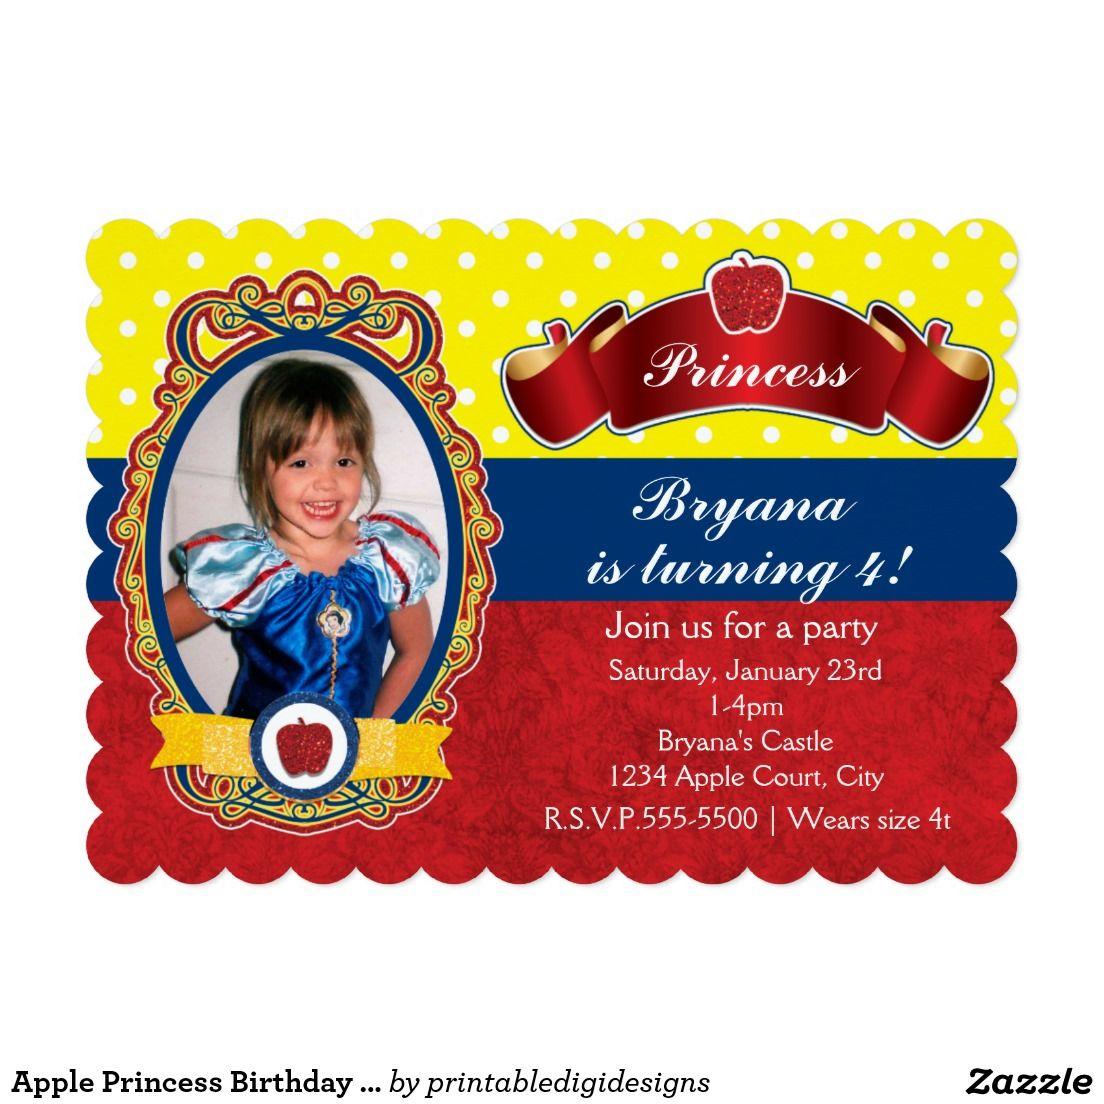 Apple Princess Birthday Party Photo Invitations | Girls Birthday ...